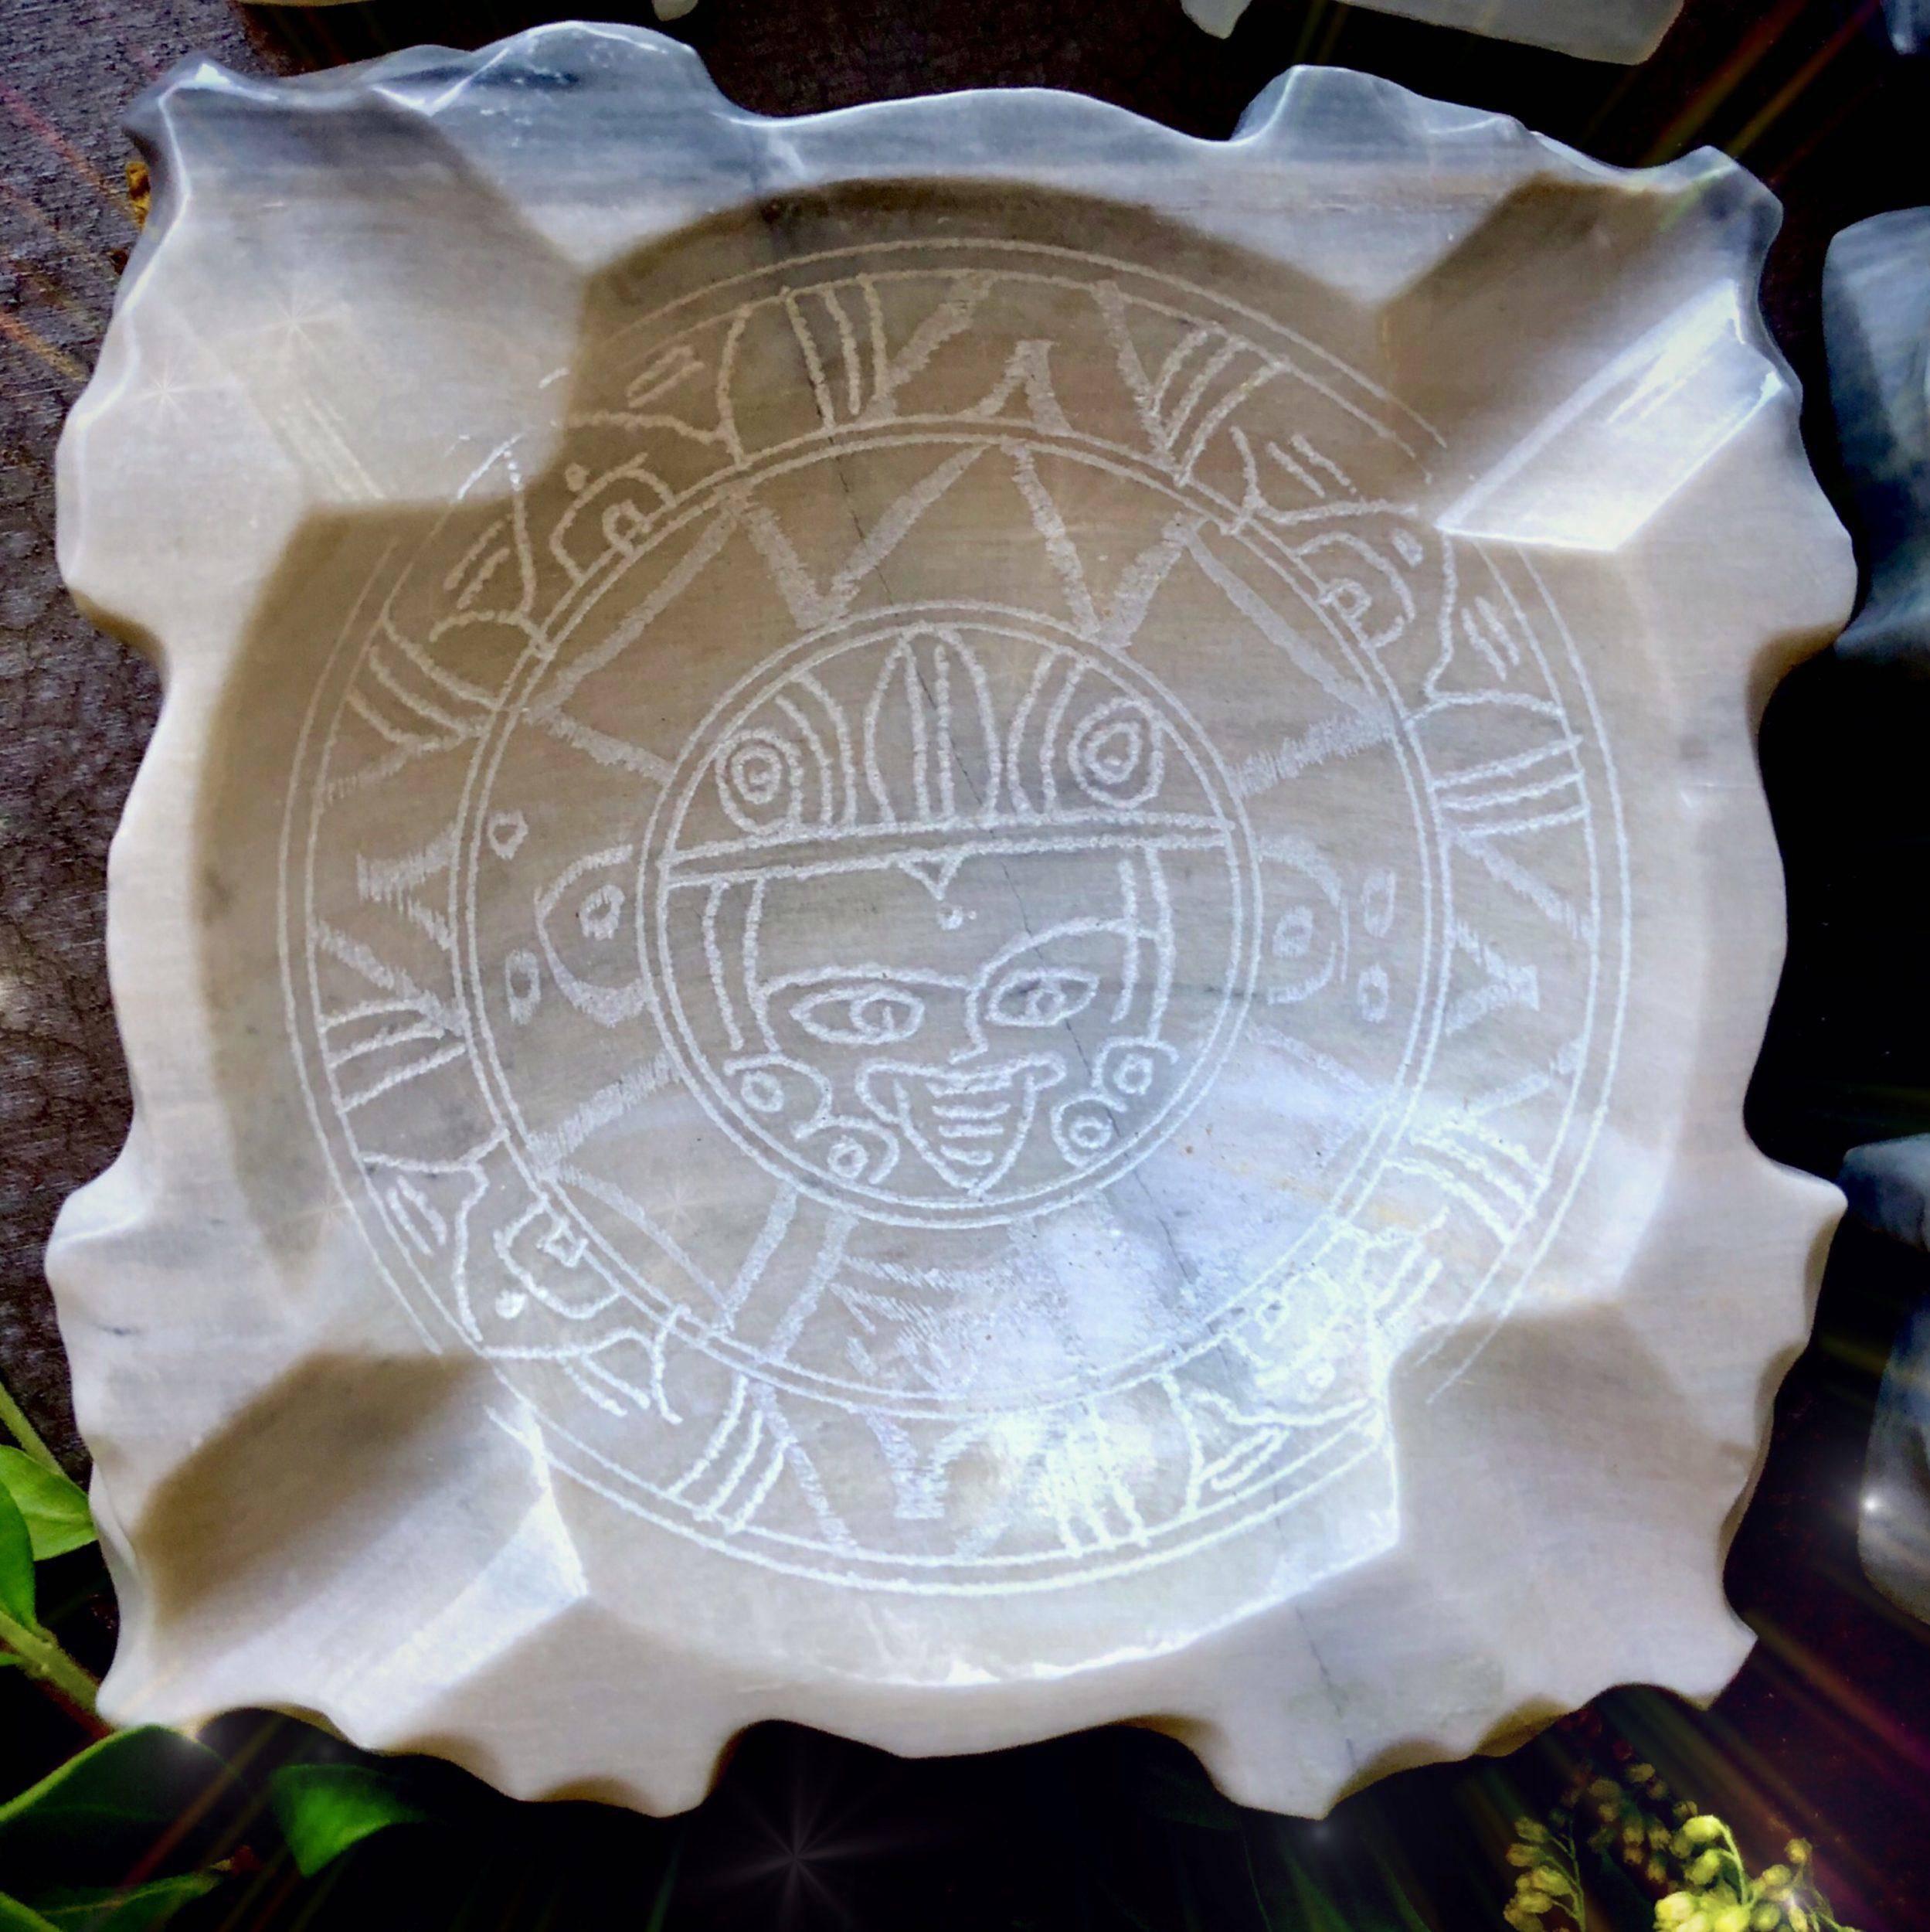 Aztec_Calendar_Offering_Bowl_4of4_8_26